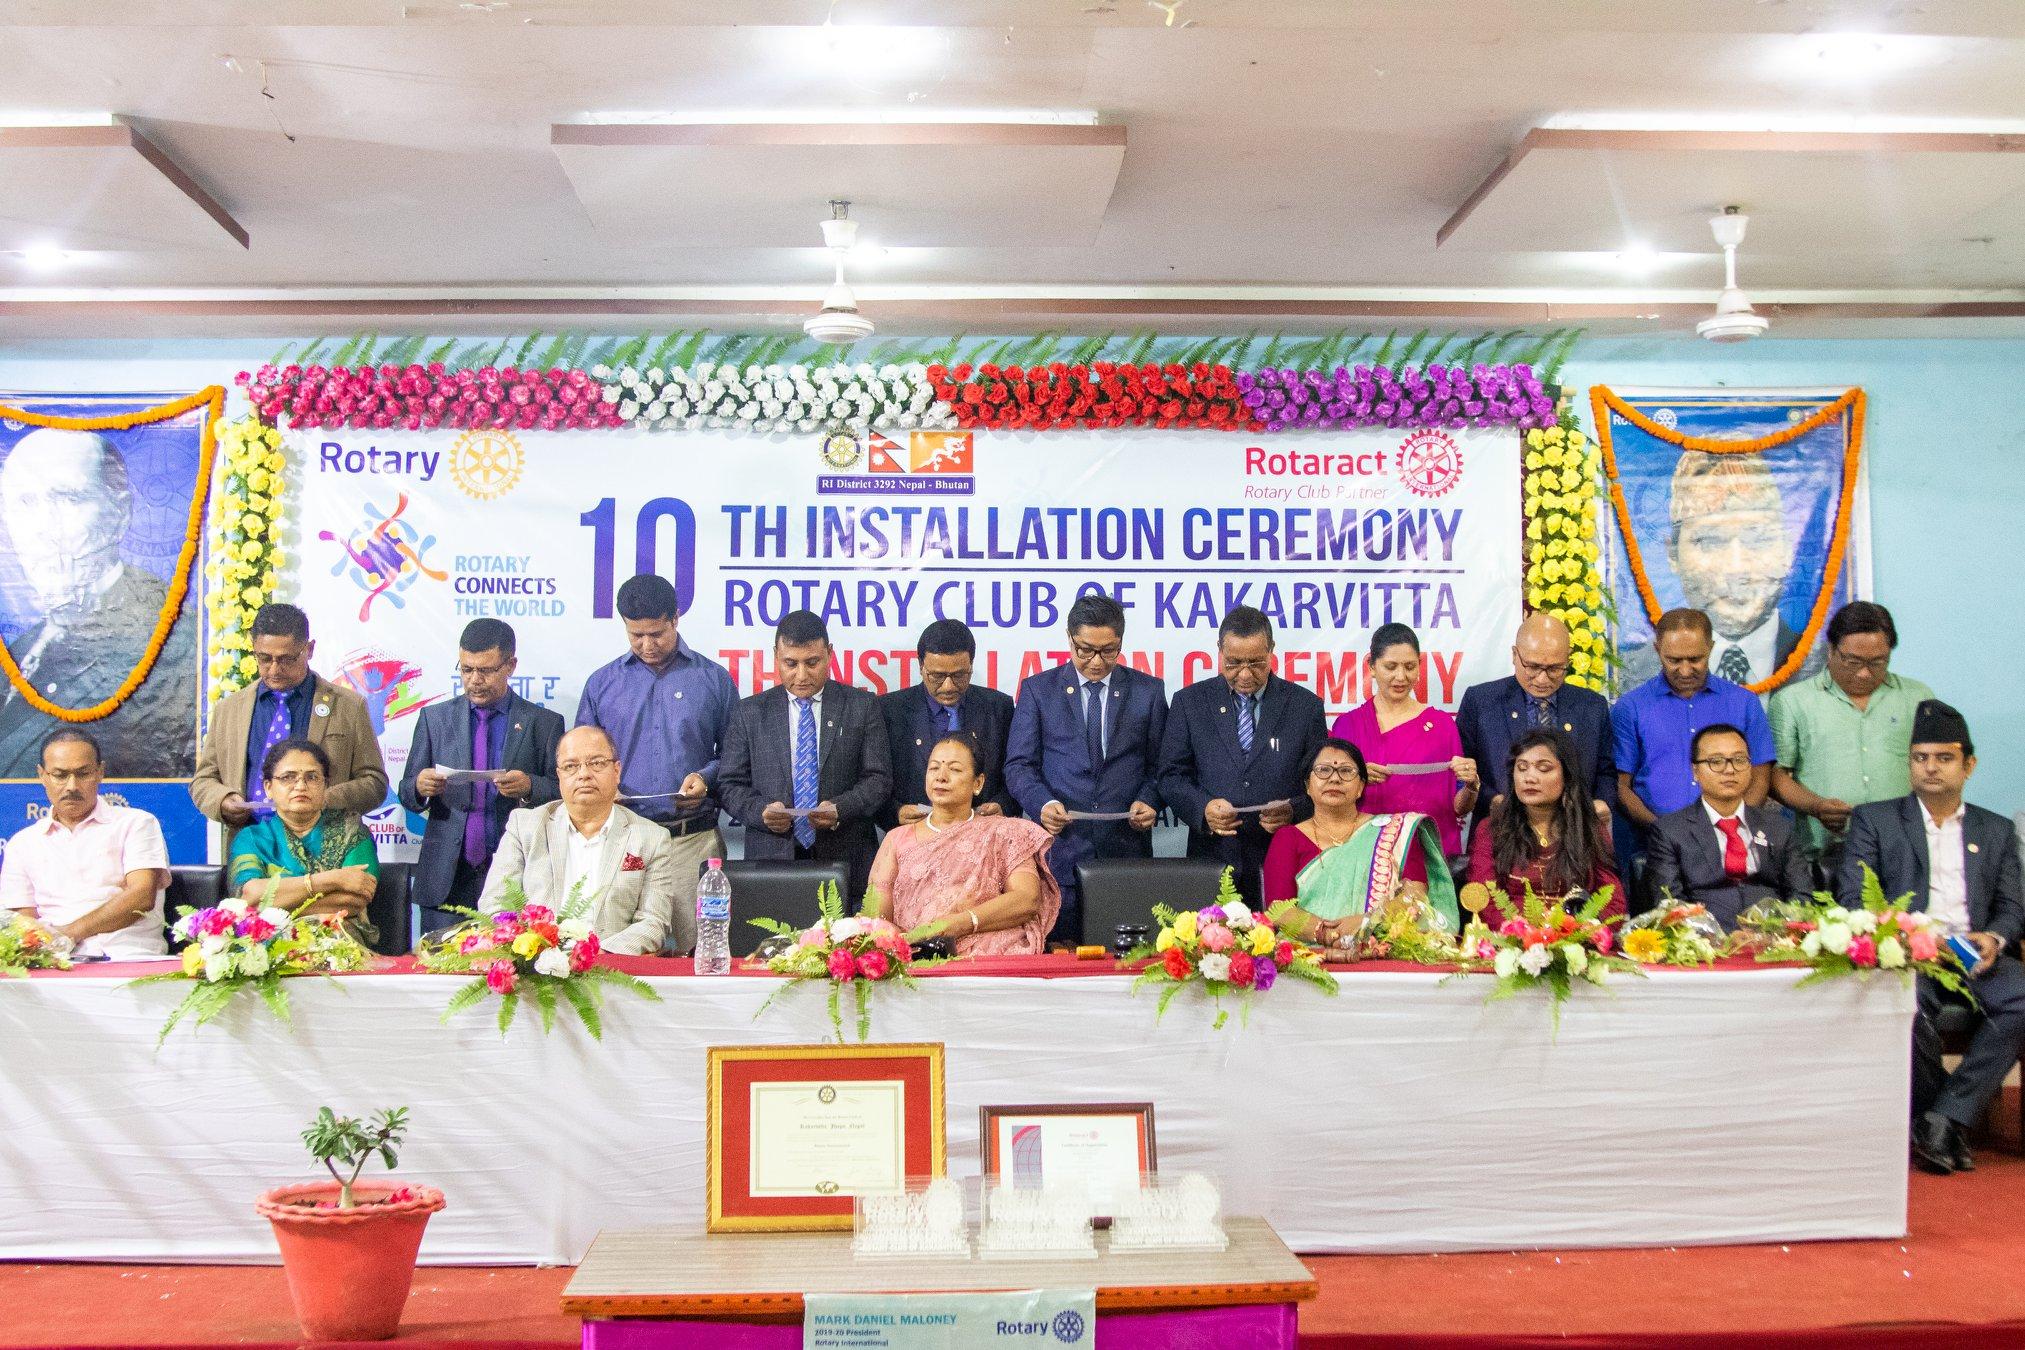 10th Installation Ceremony Rotary Club Of Kakarvitta 29